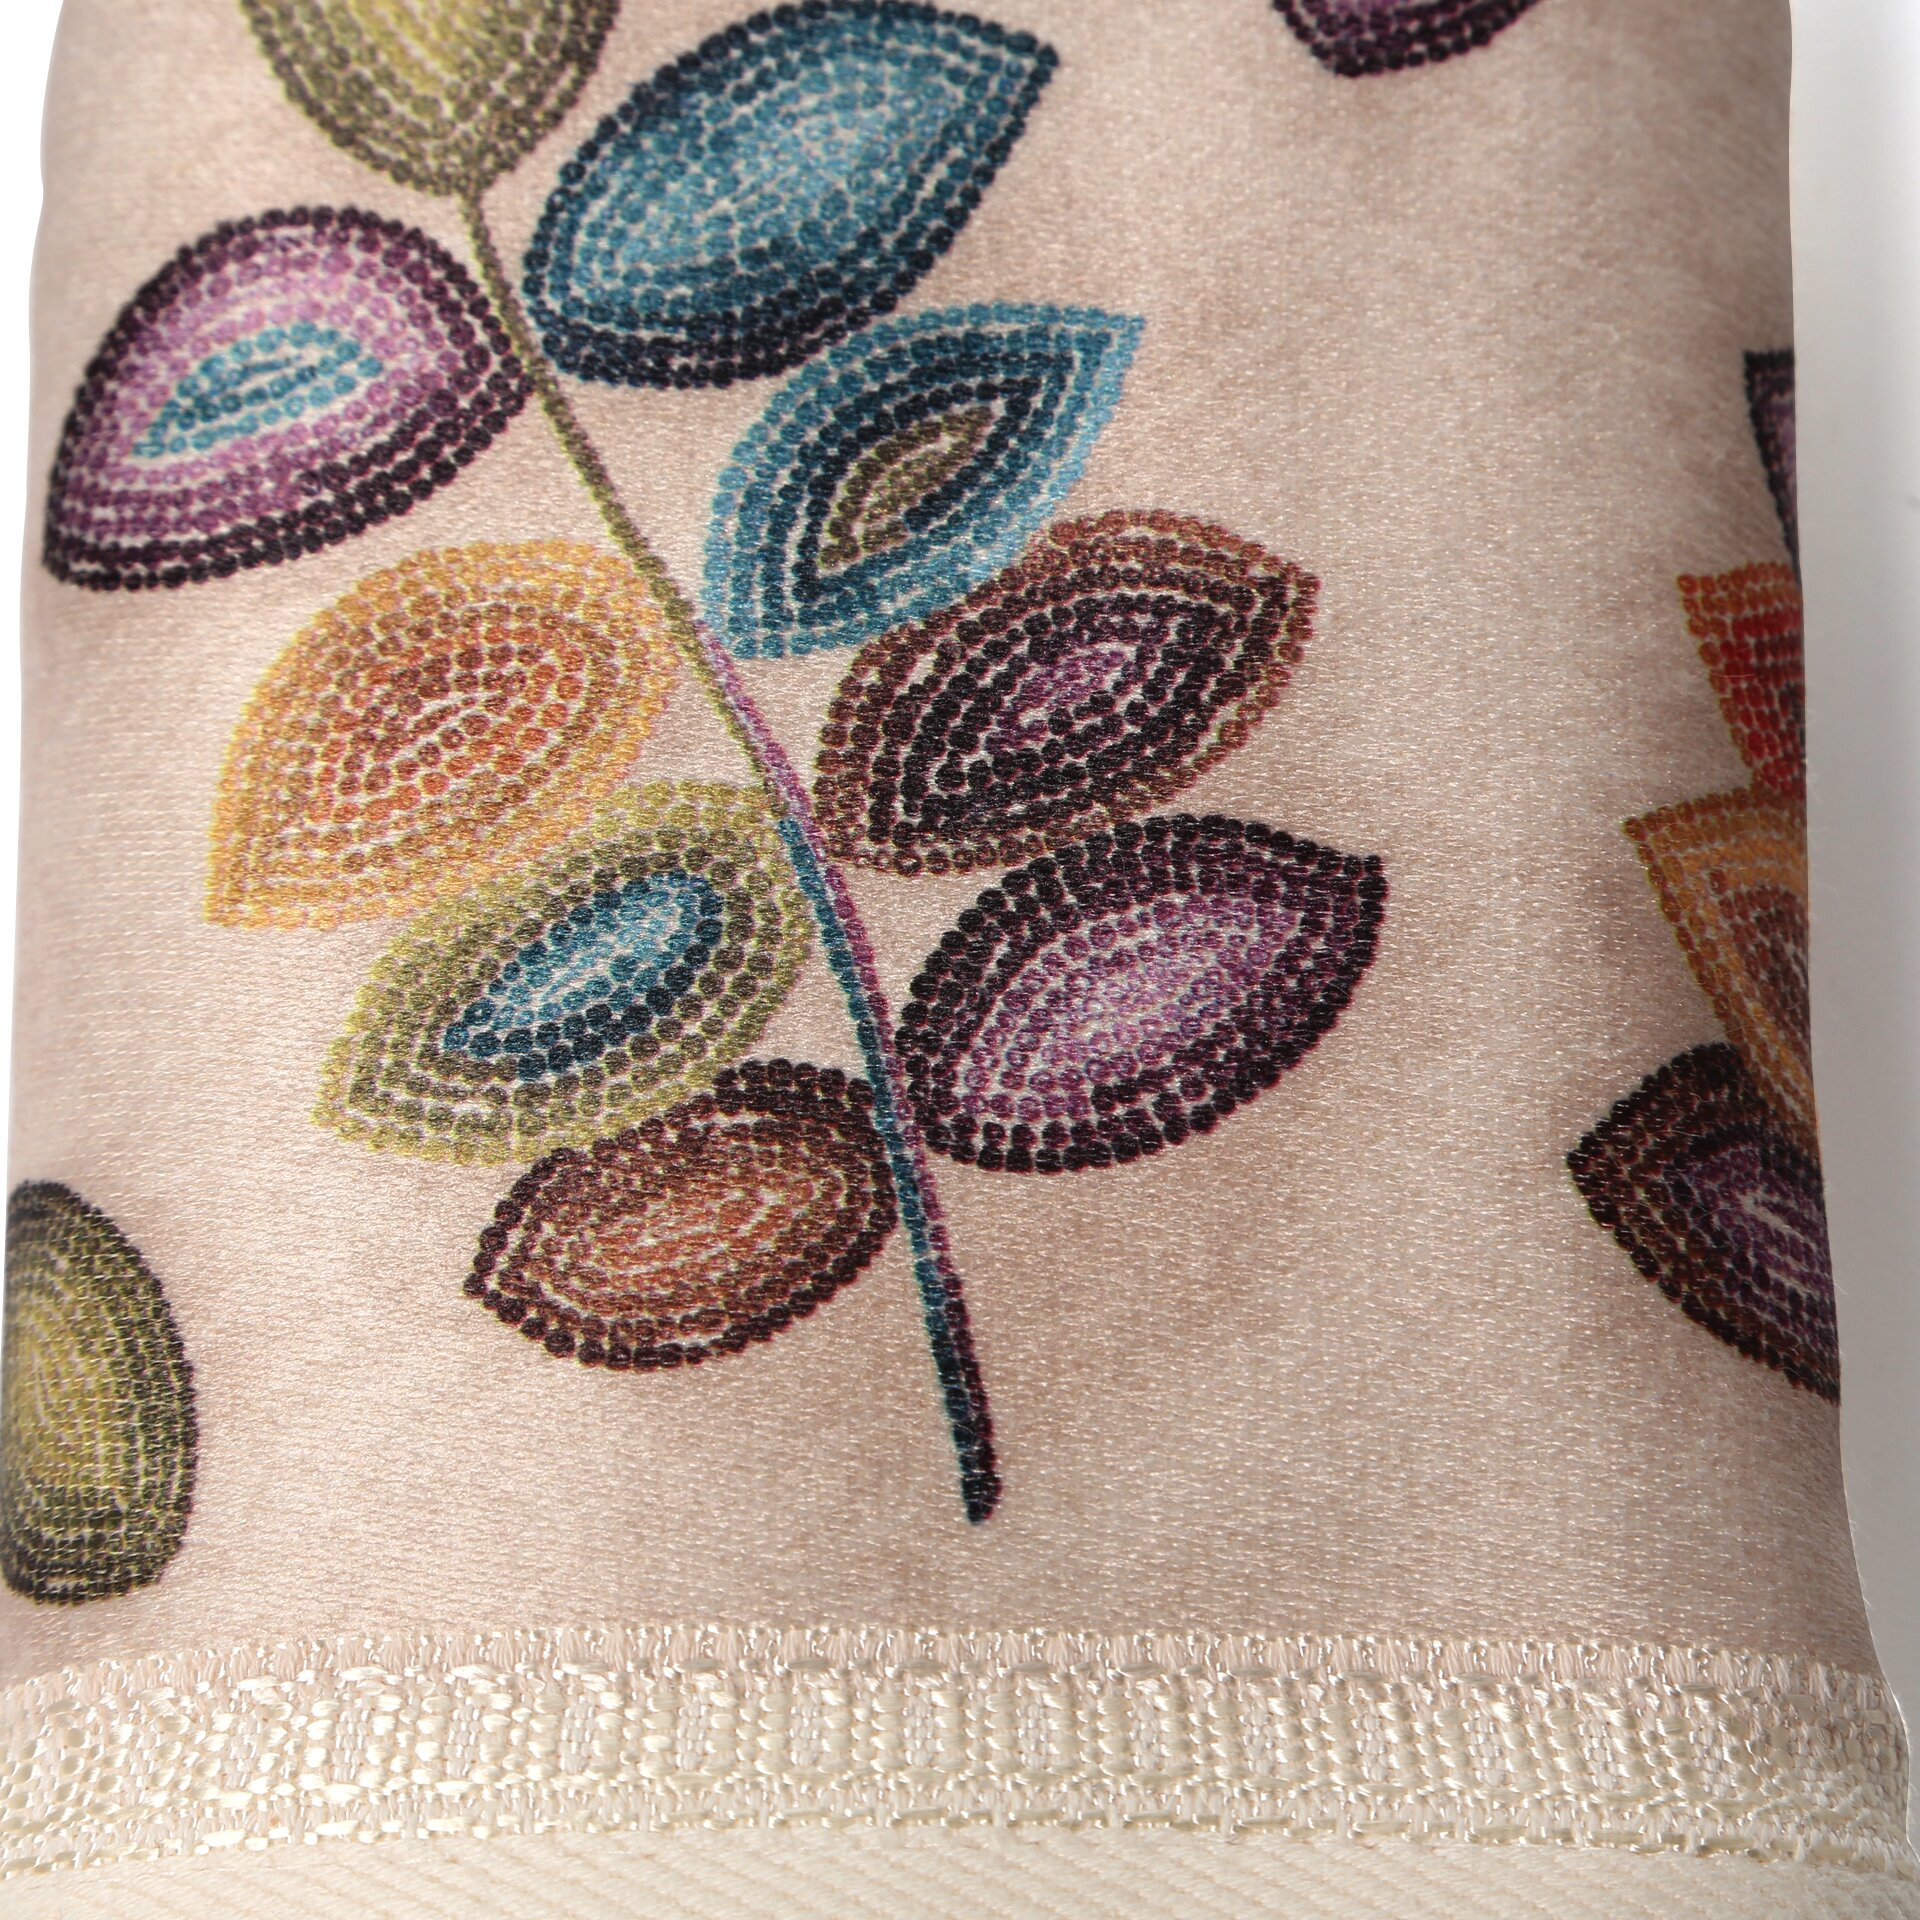 Croscill Kitchen Towels: Croscill Mosaic Leaves Hand Towel & Reviews